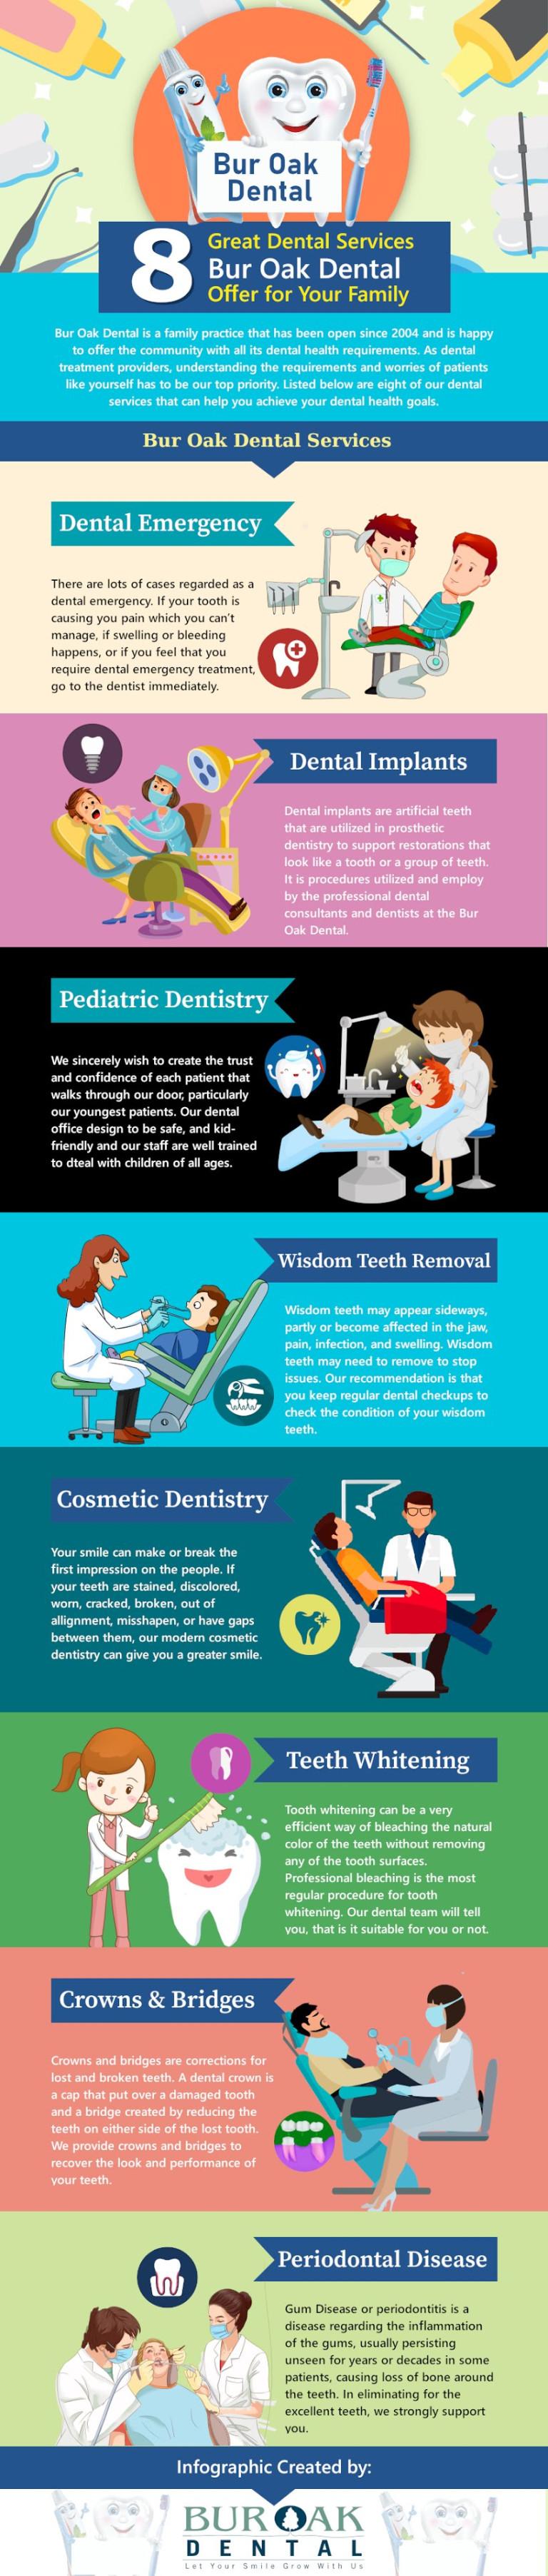 8 Great Dental Services Bur Oak Dental Offer for Your Family